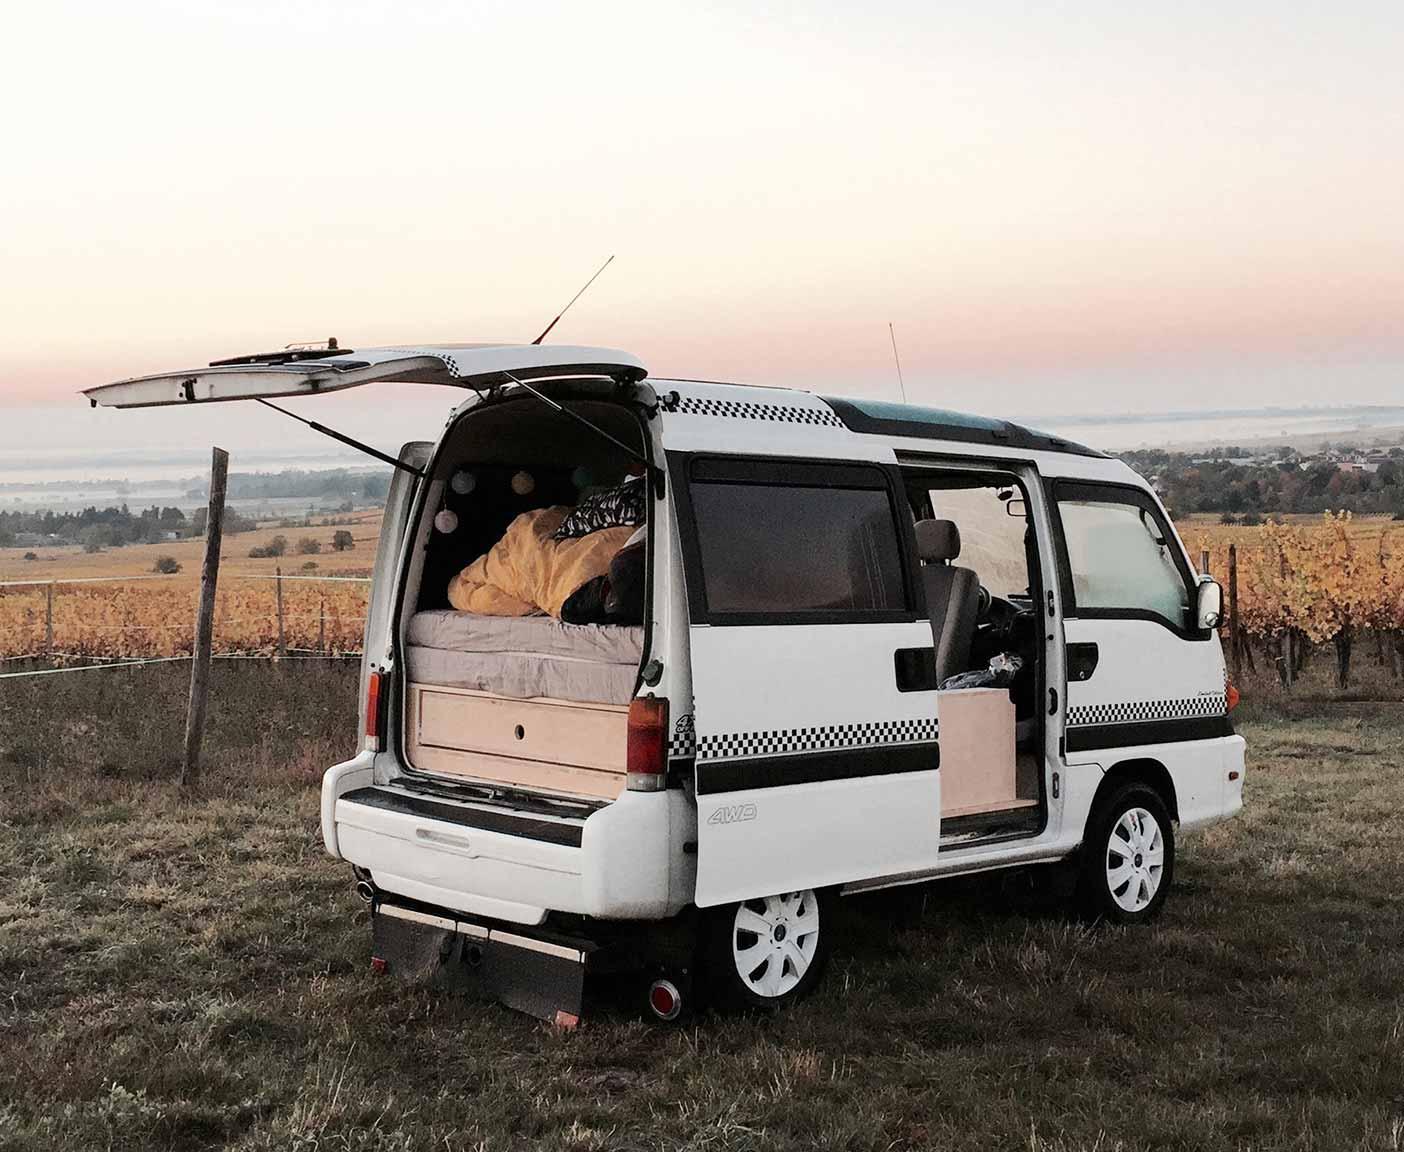 umbau-e10-4x4-allrad-camper-minicamper-daihatsu-hijet-piaggio-porter-3